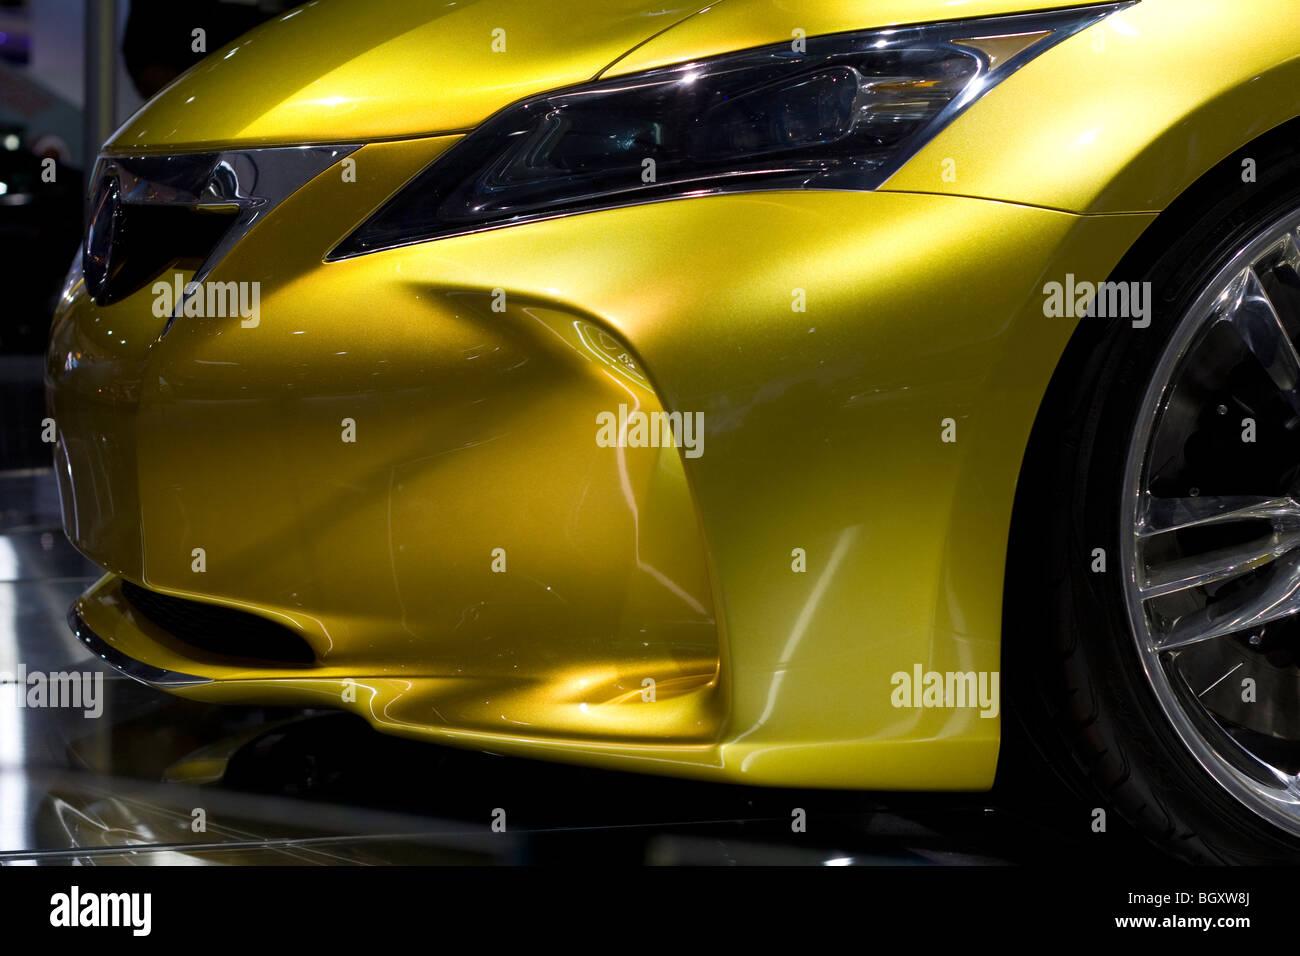 http://c8.alamy.com/comp/BGXW8J/2009-2010-lexus-lf-ch-concept-at-2010-north-american-international-BGXW8J.jpg